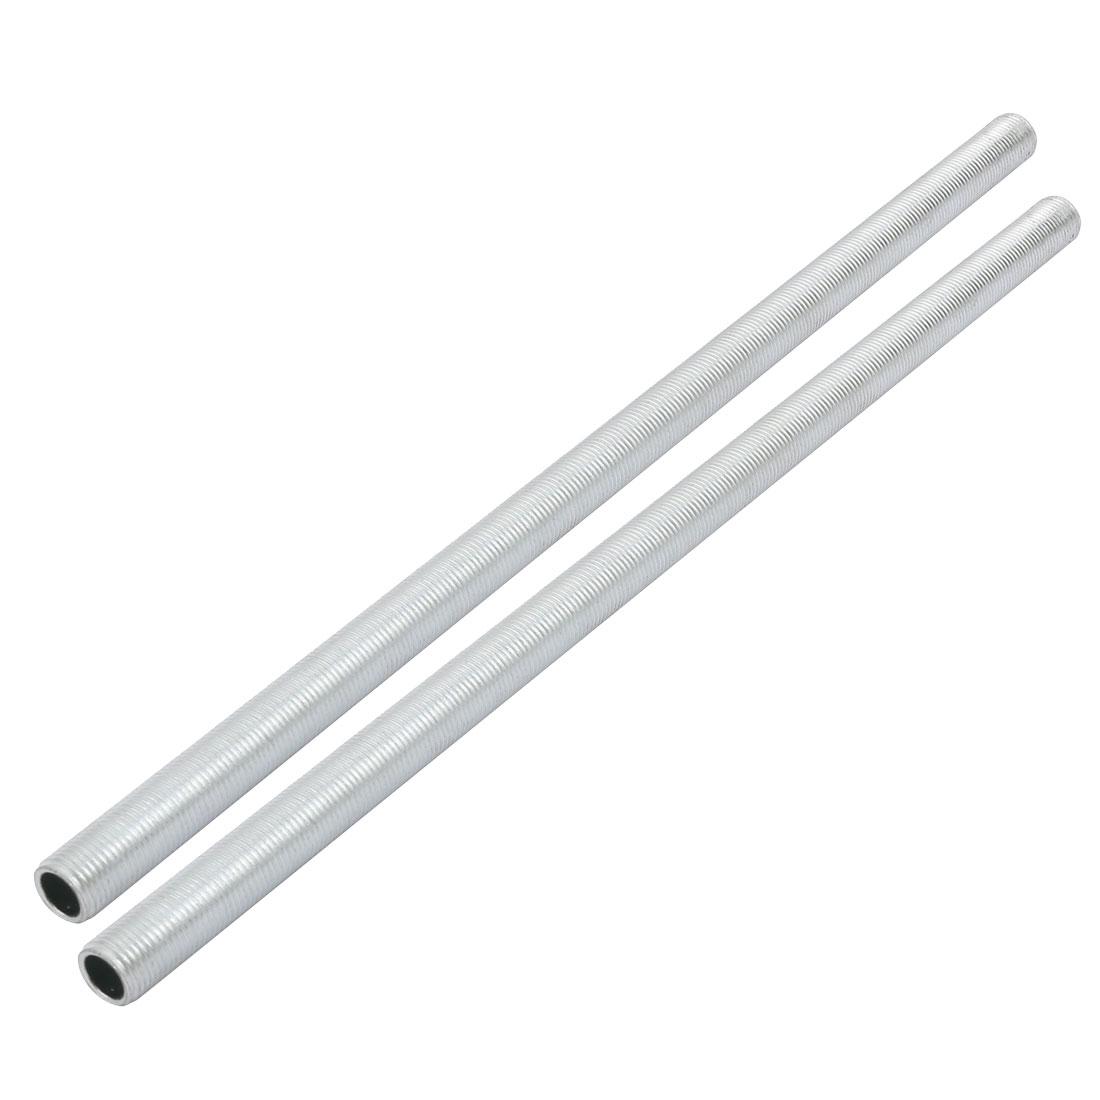 Metric M10 1mm Pitch Thread Zinc Plated Pipe Nipple Lamp Parts 250mm Long 2pcs